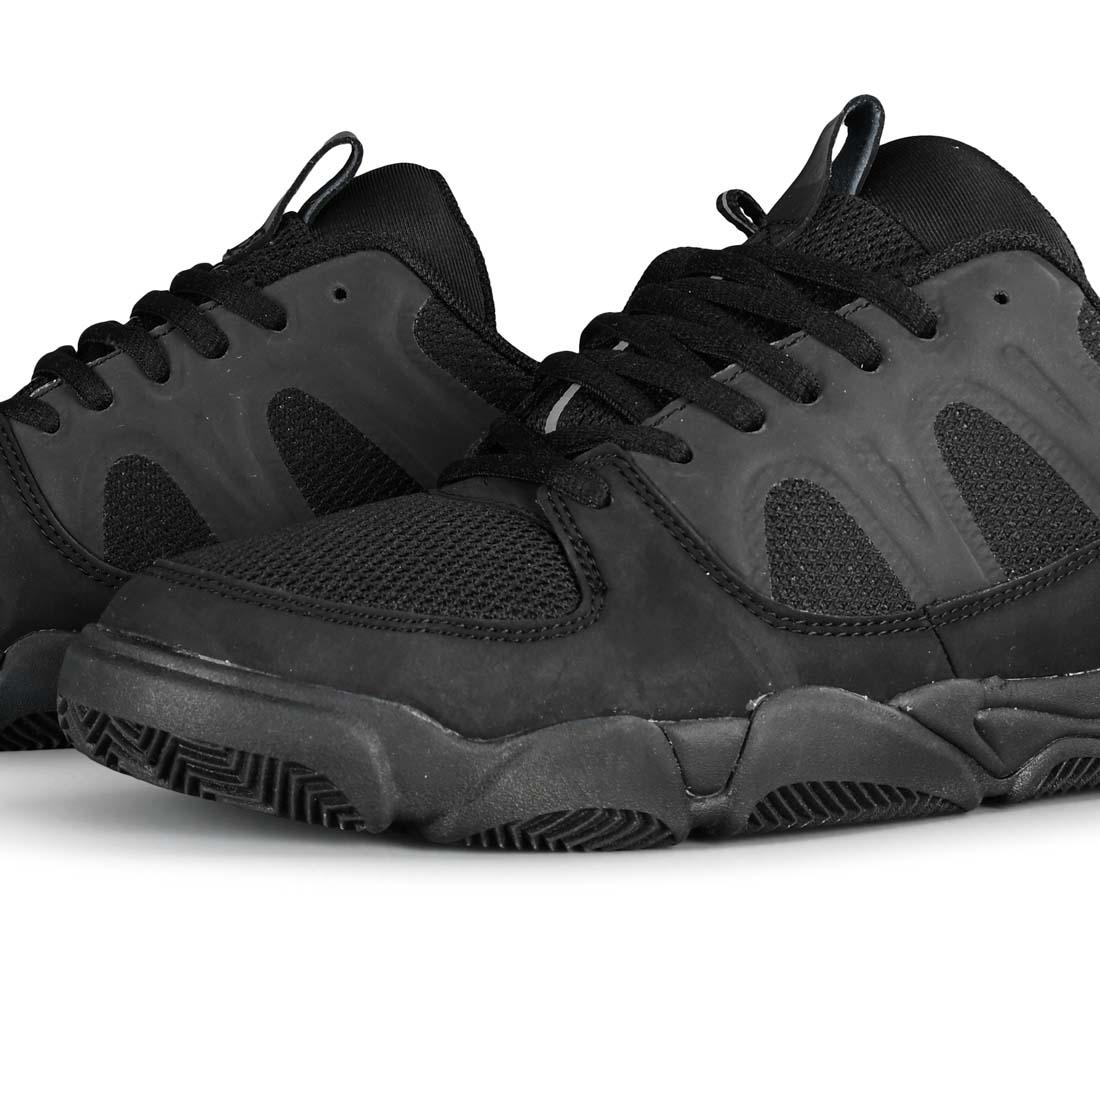 eS Silo Skate Shoes - Black / Black